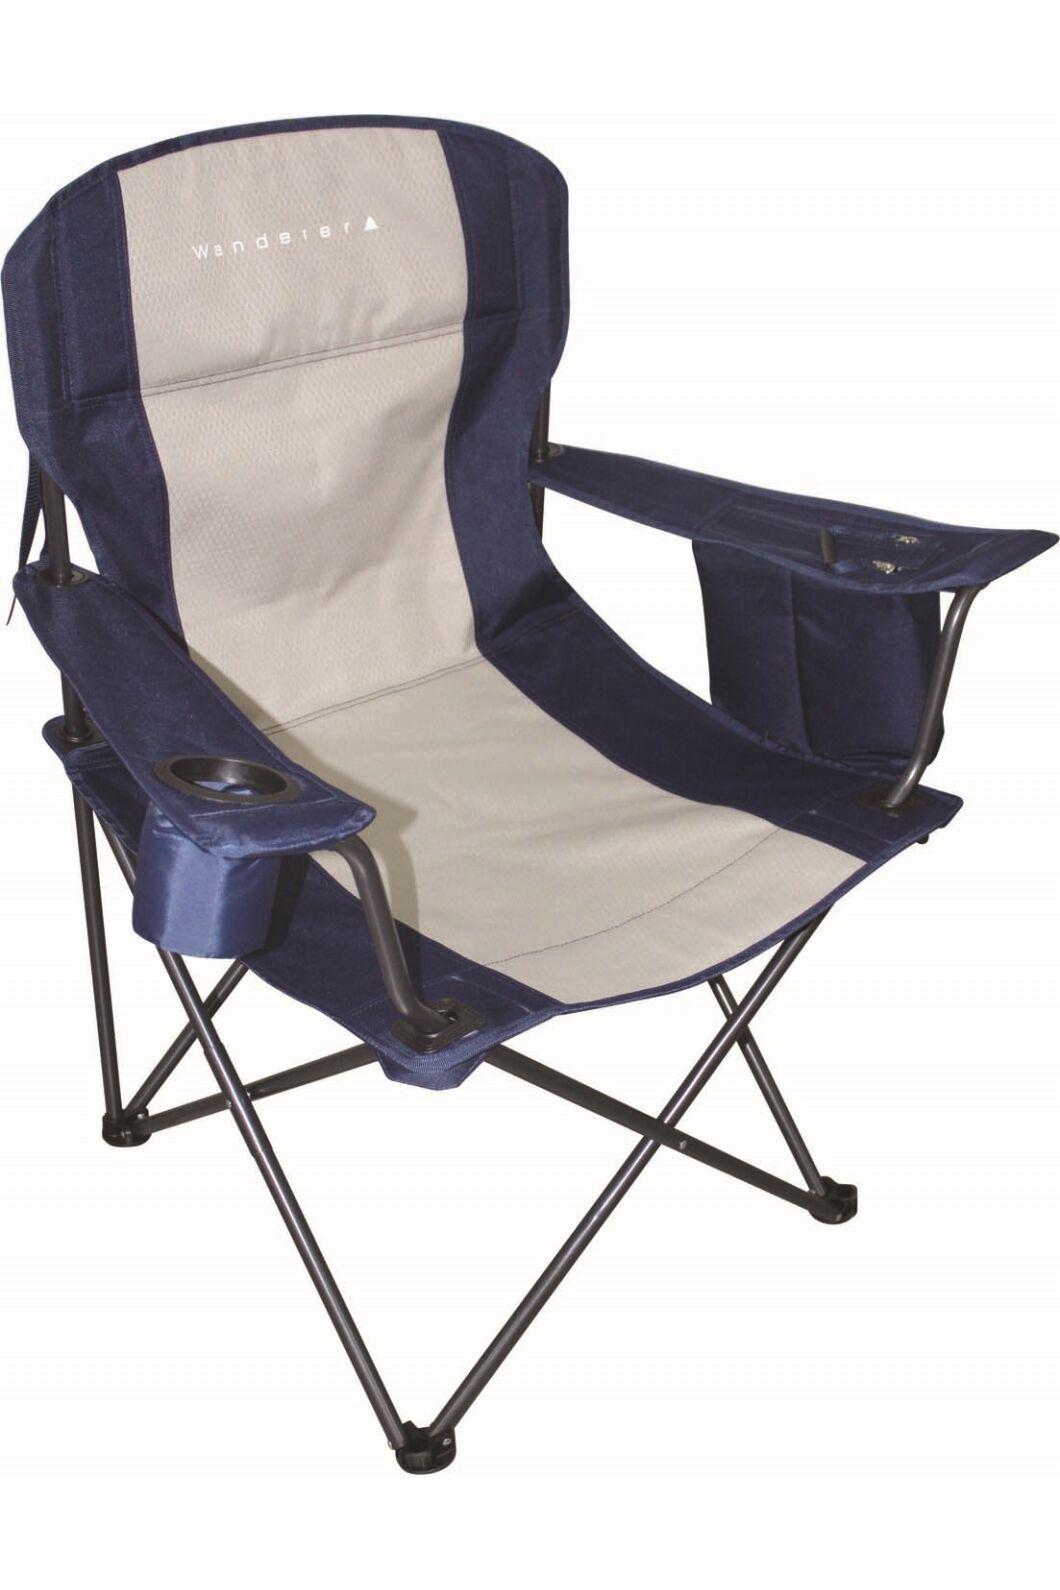 Wanderer Standard Cooler Arm Chair, None, hi-res